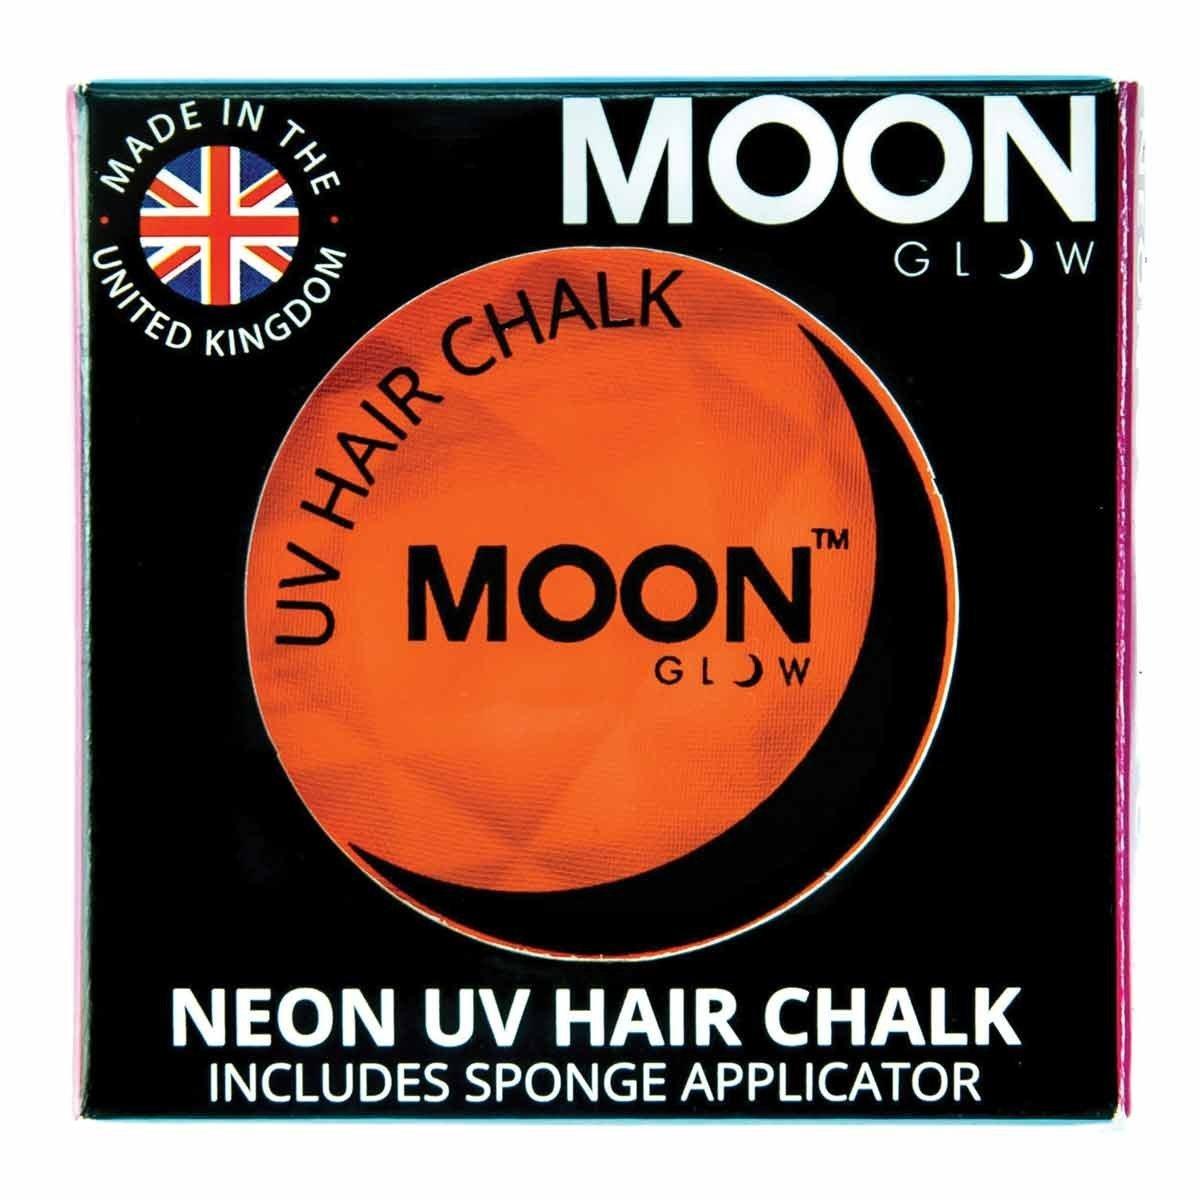 Moon Glow - Blacklight Neon Hair Chalk 0.12ozOrange– Glows brightly under Blacklights / UV Lighting!